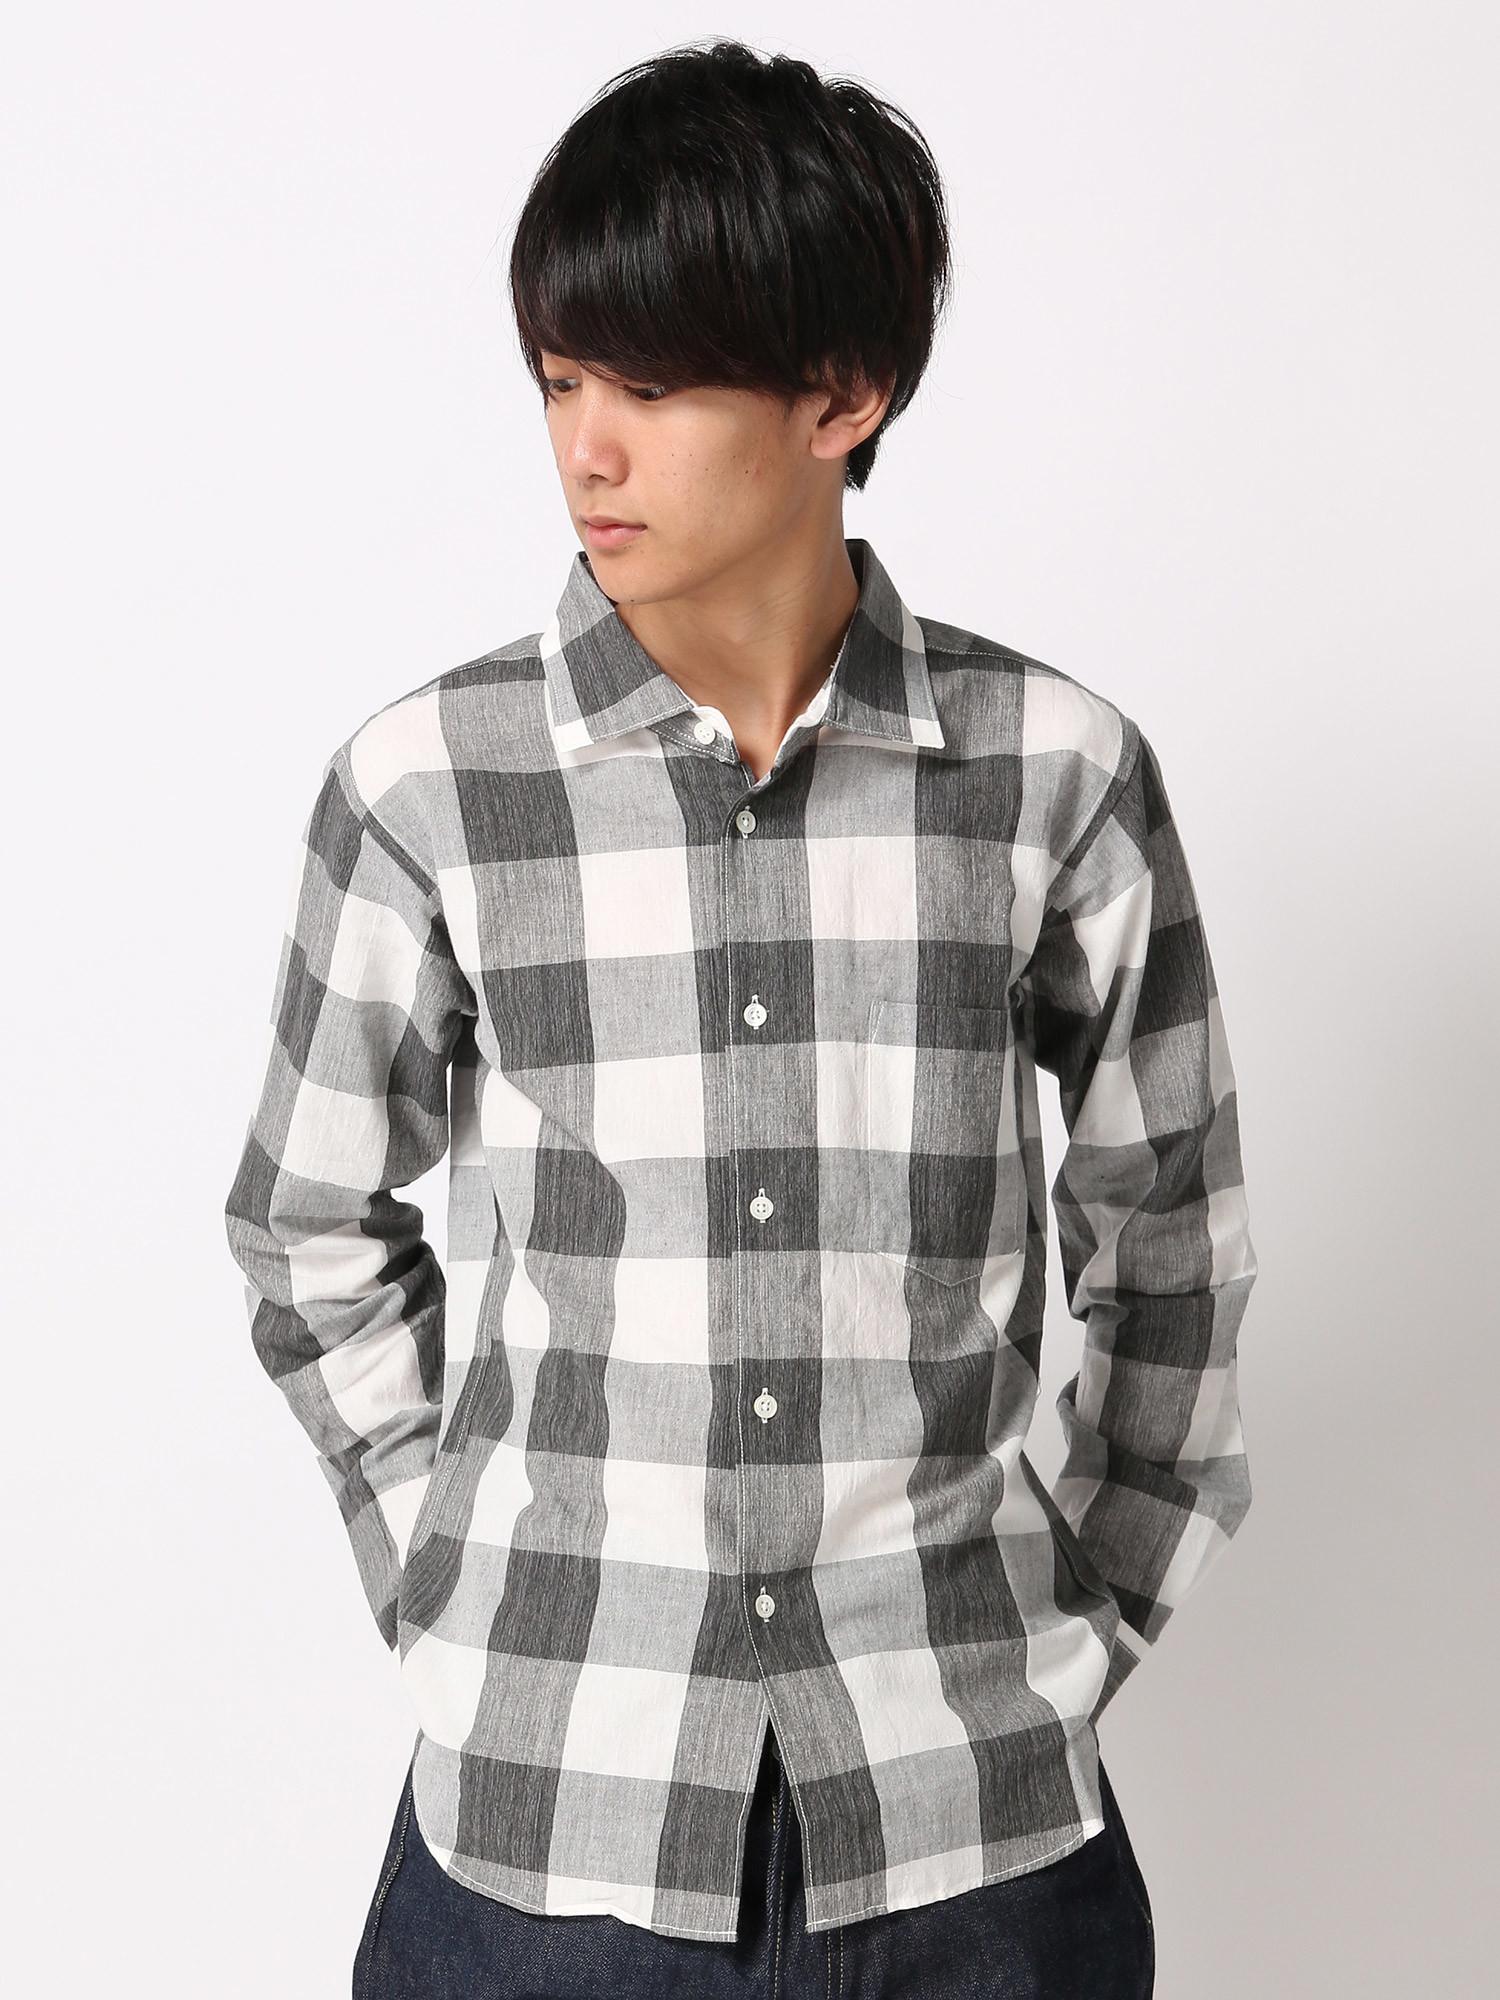 【JapanMade】BLOCK CHECK SHIRTS/ブロックチェックシャツ